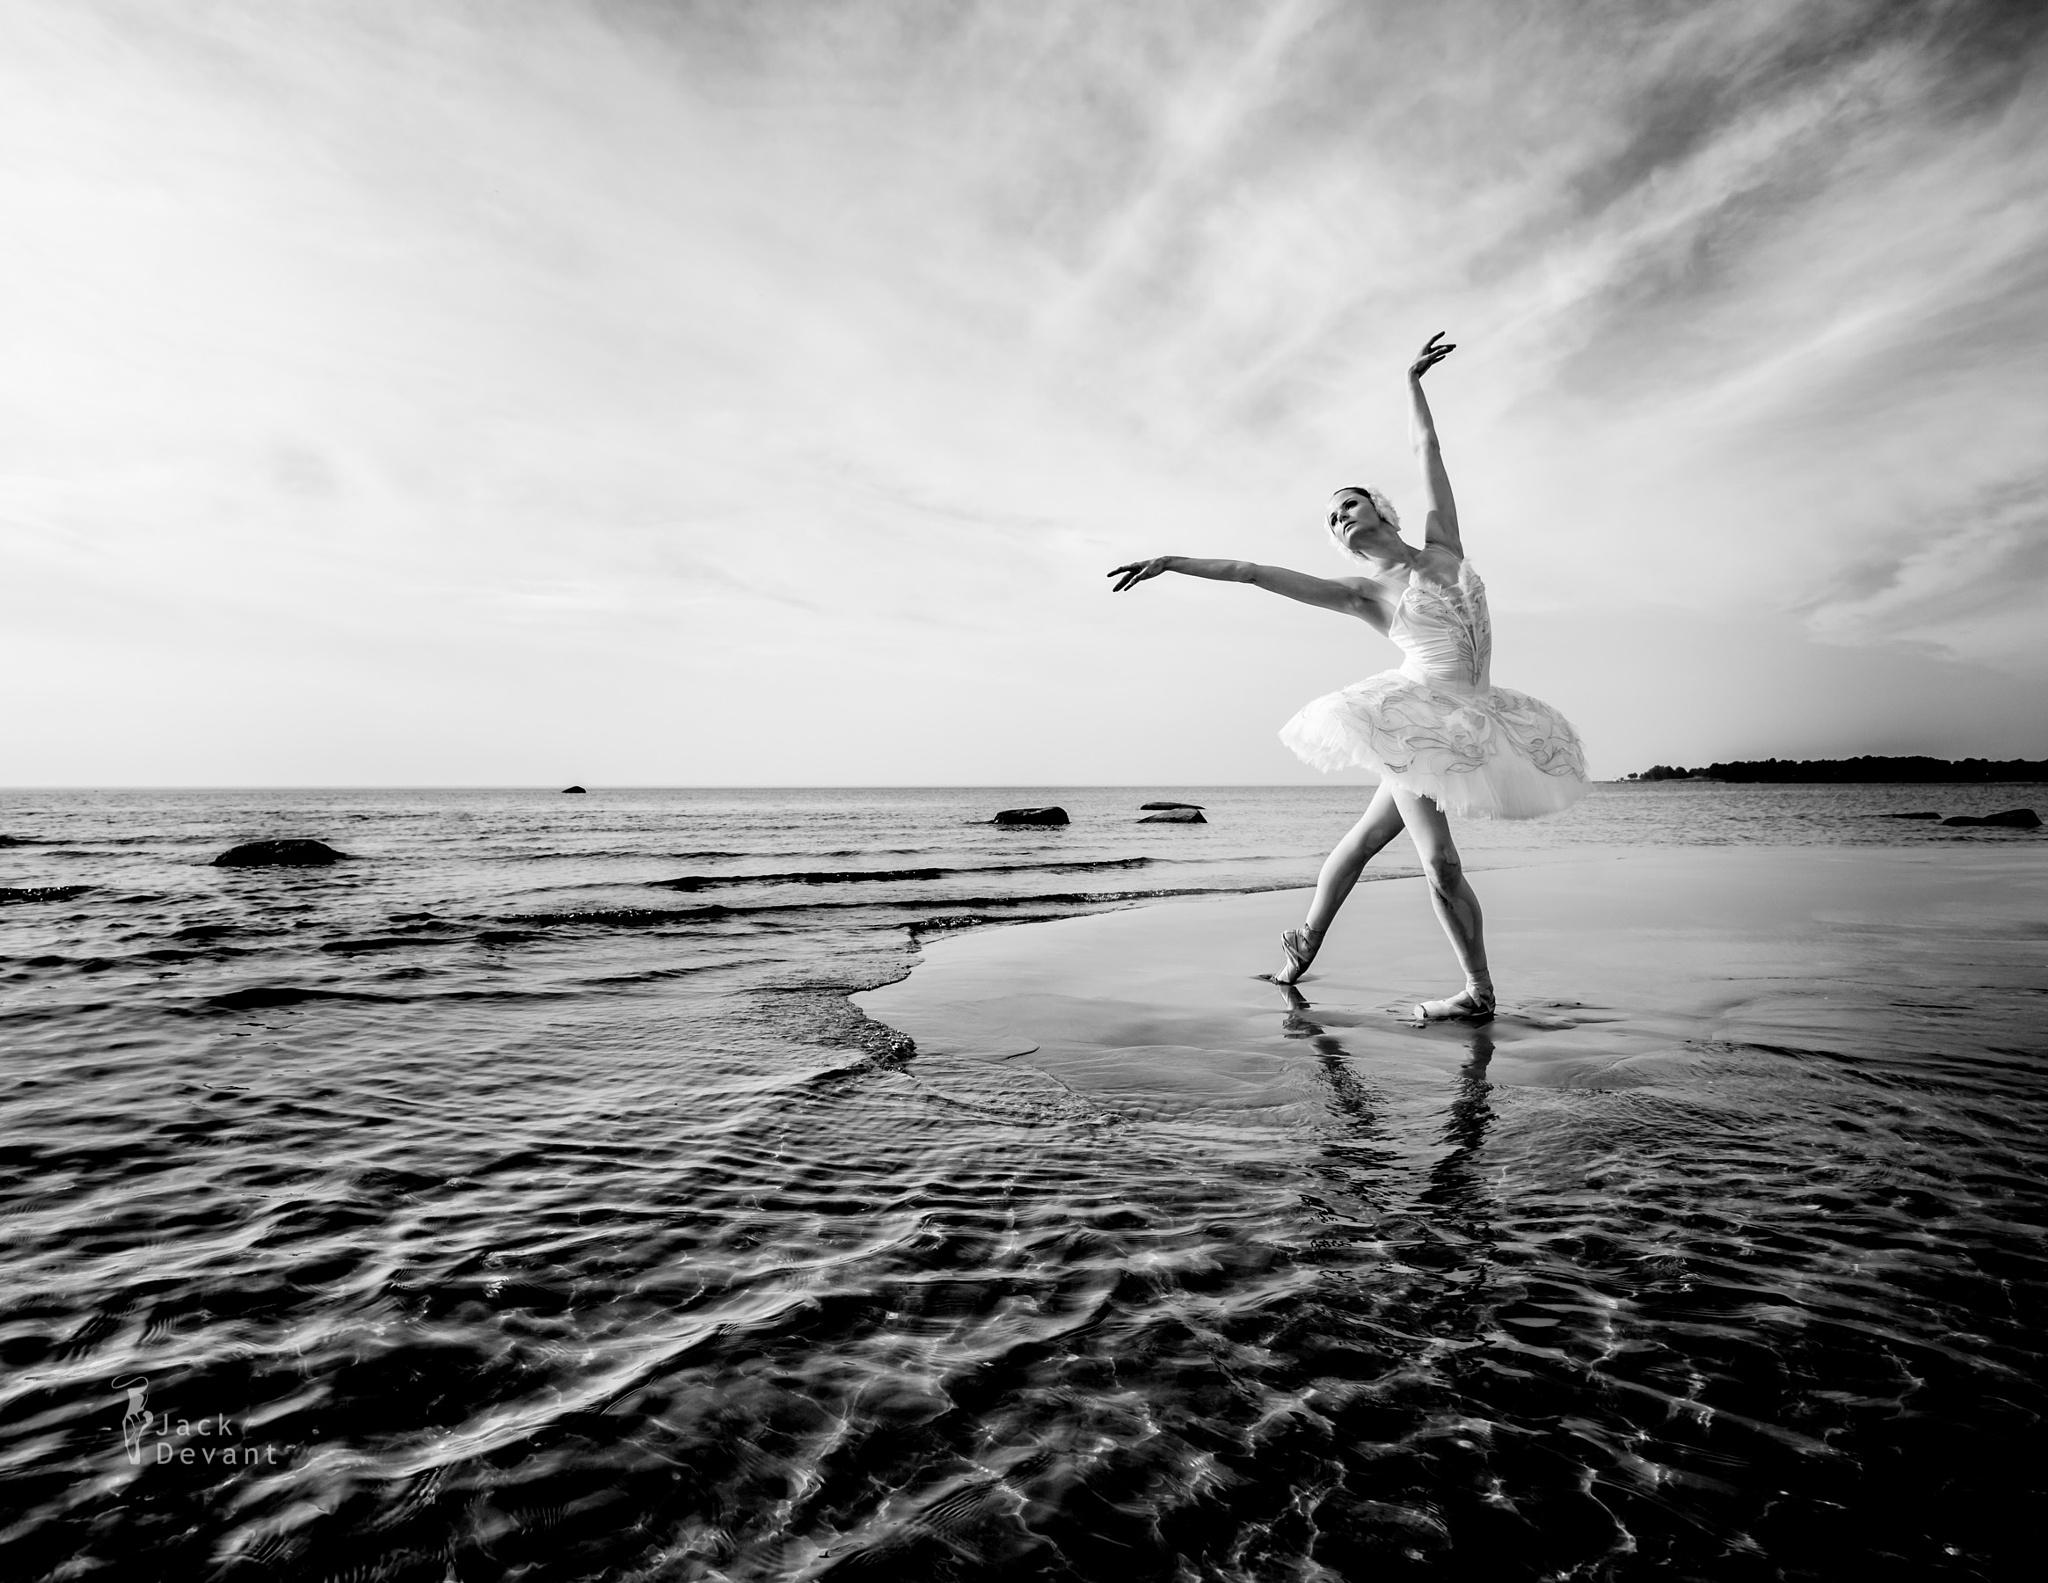 White Swan II by Jack Devant